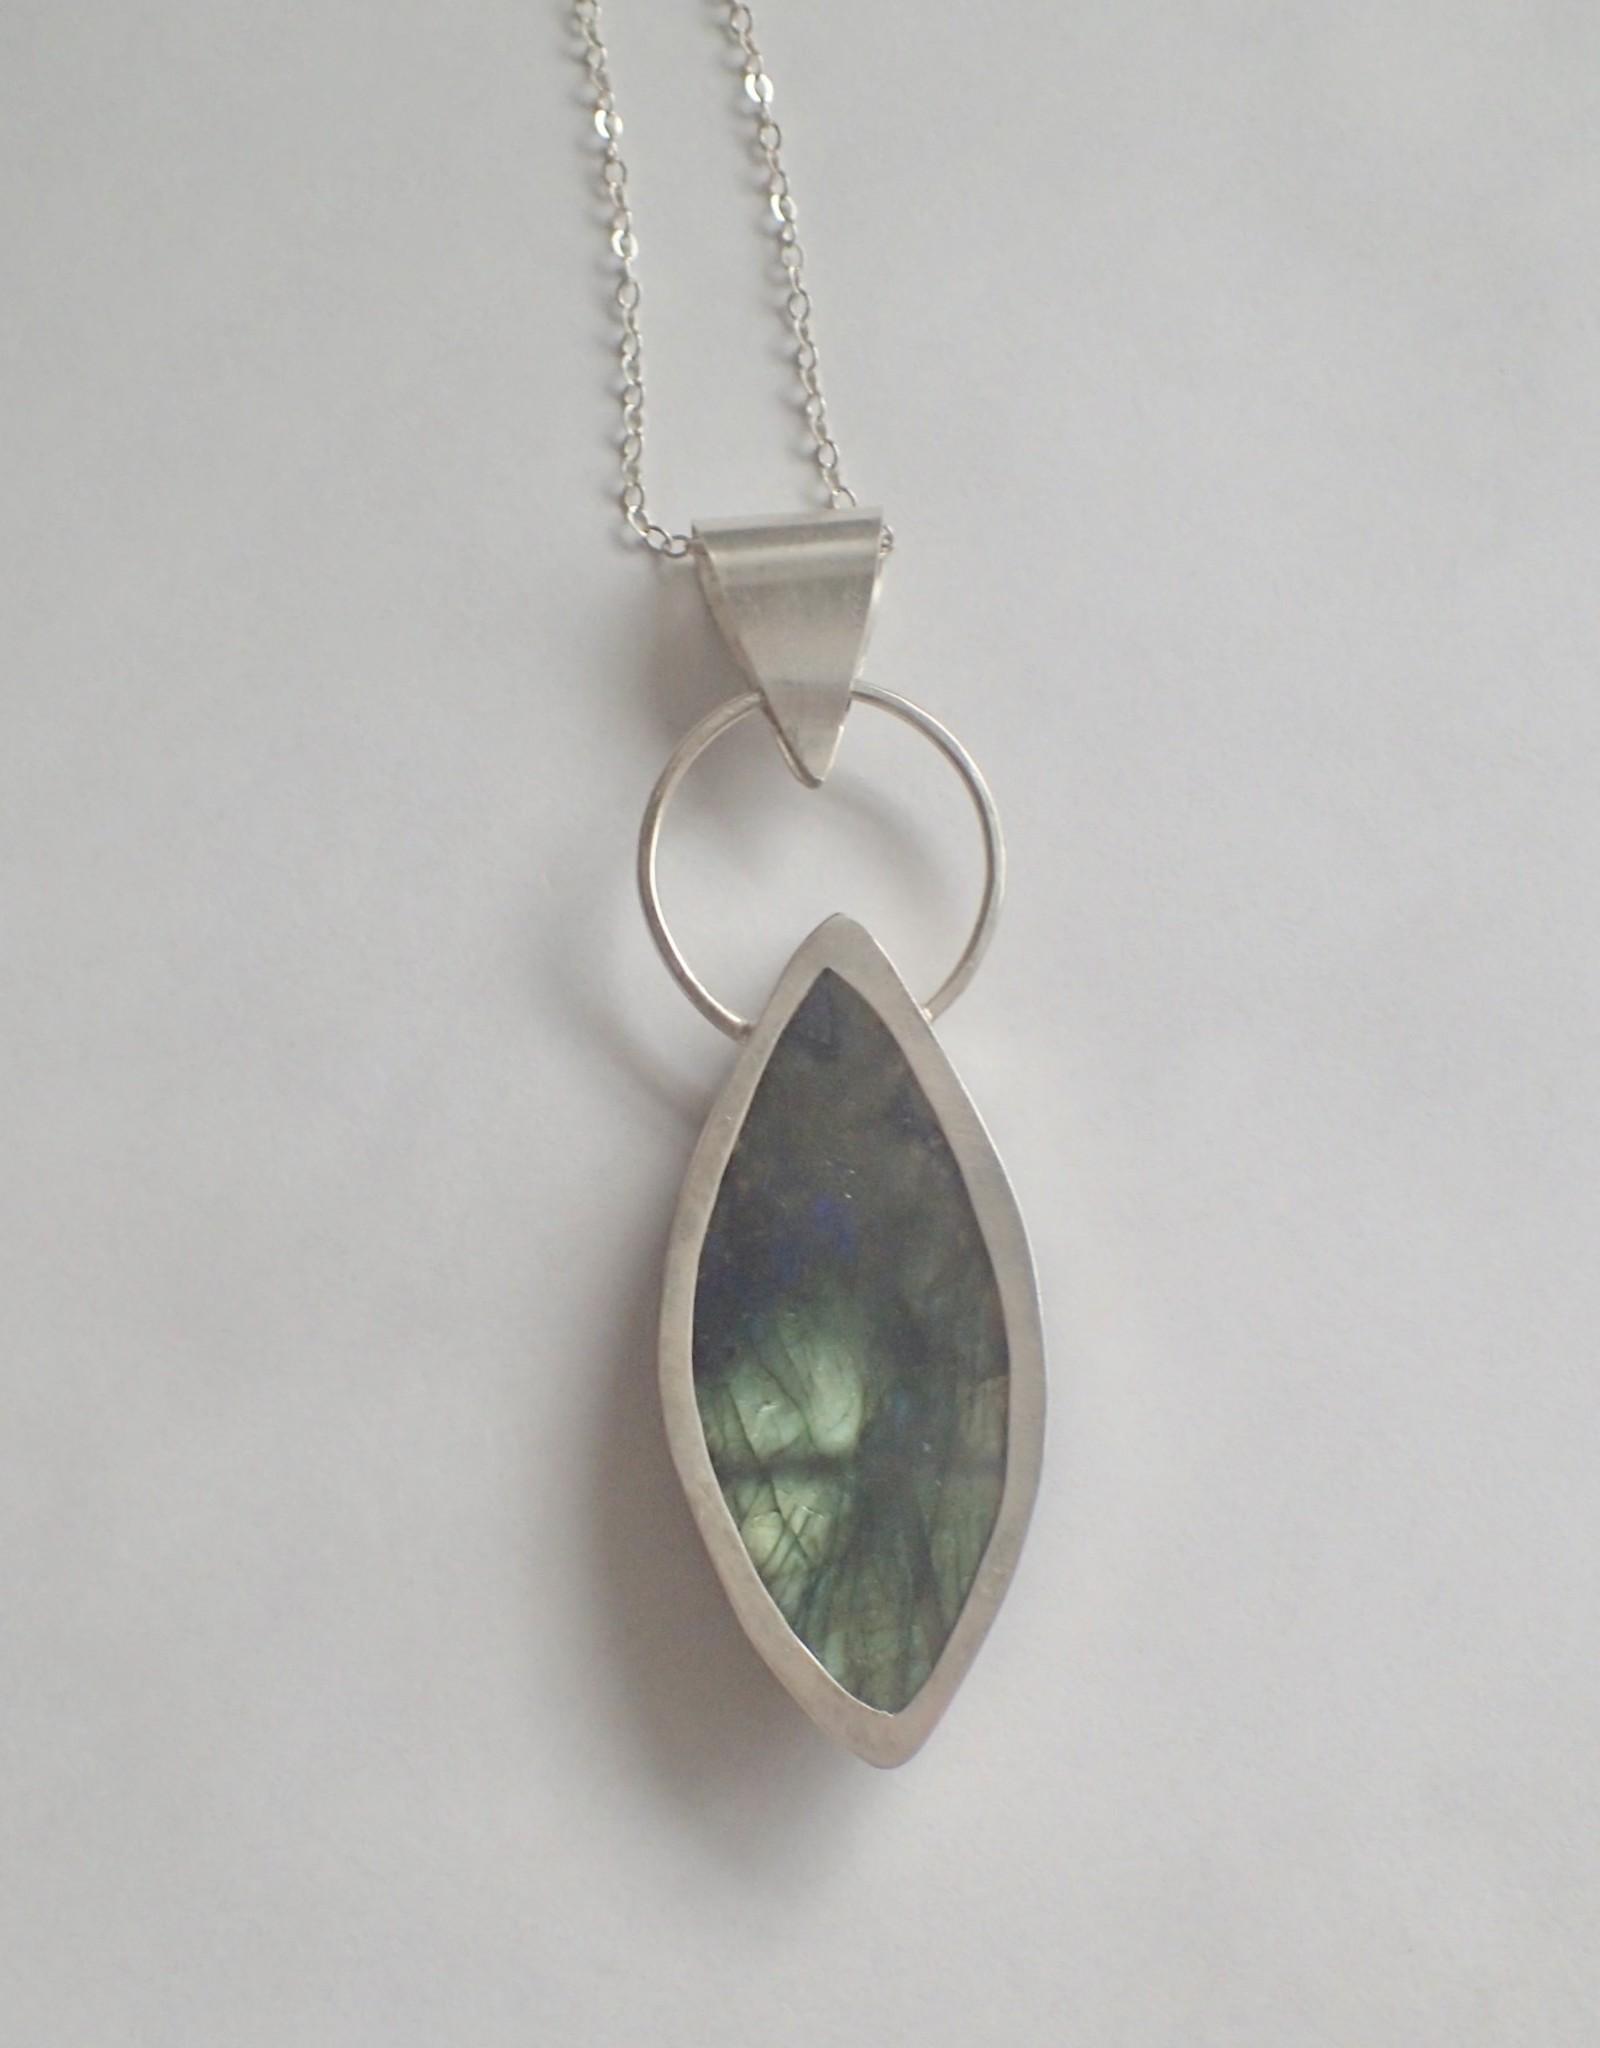 Lilly Parker Labradorite, Sterling silver Pendant